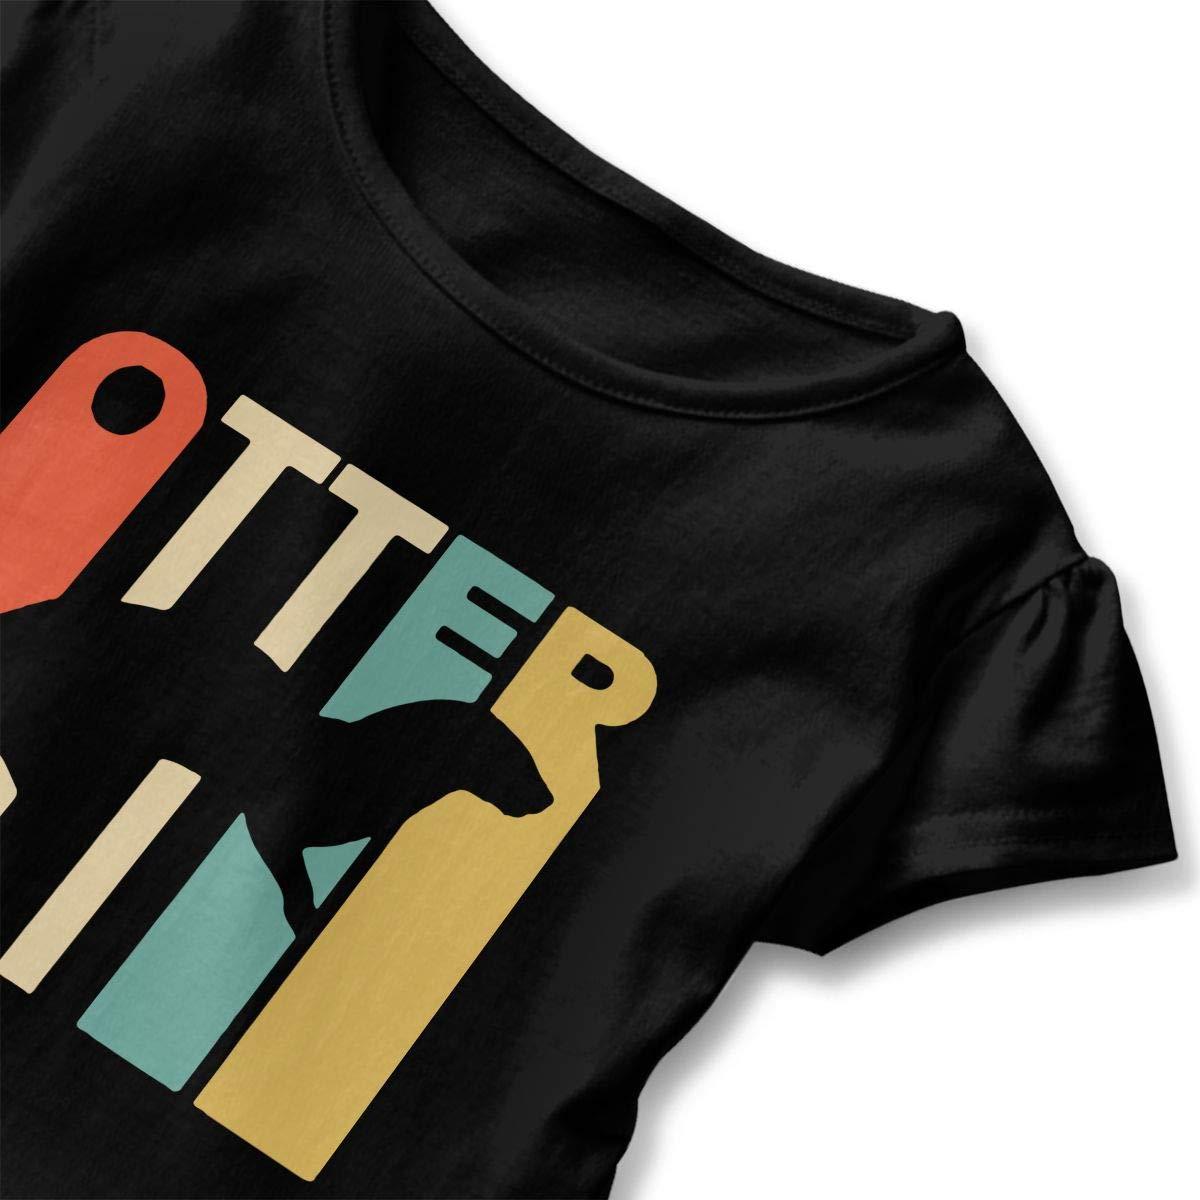 SHIRT1-KIDS Style Otter Toddler//Infant Girls Short Sleeve Ruffles Shirt Tee Jersey for 2-6 Toddlers